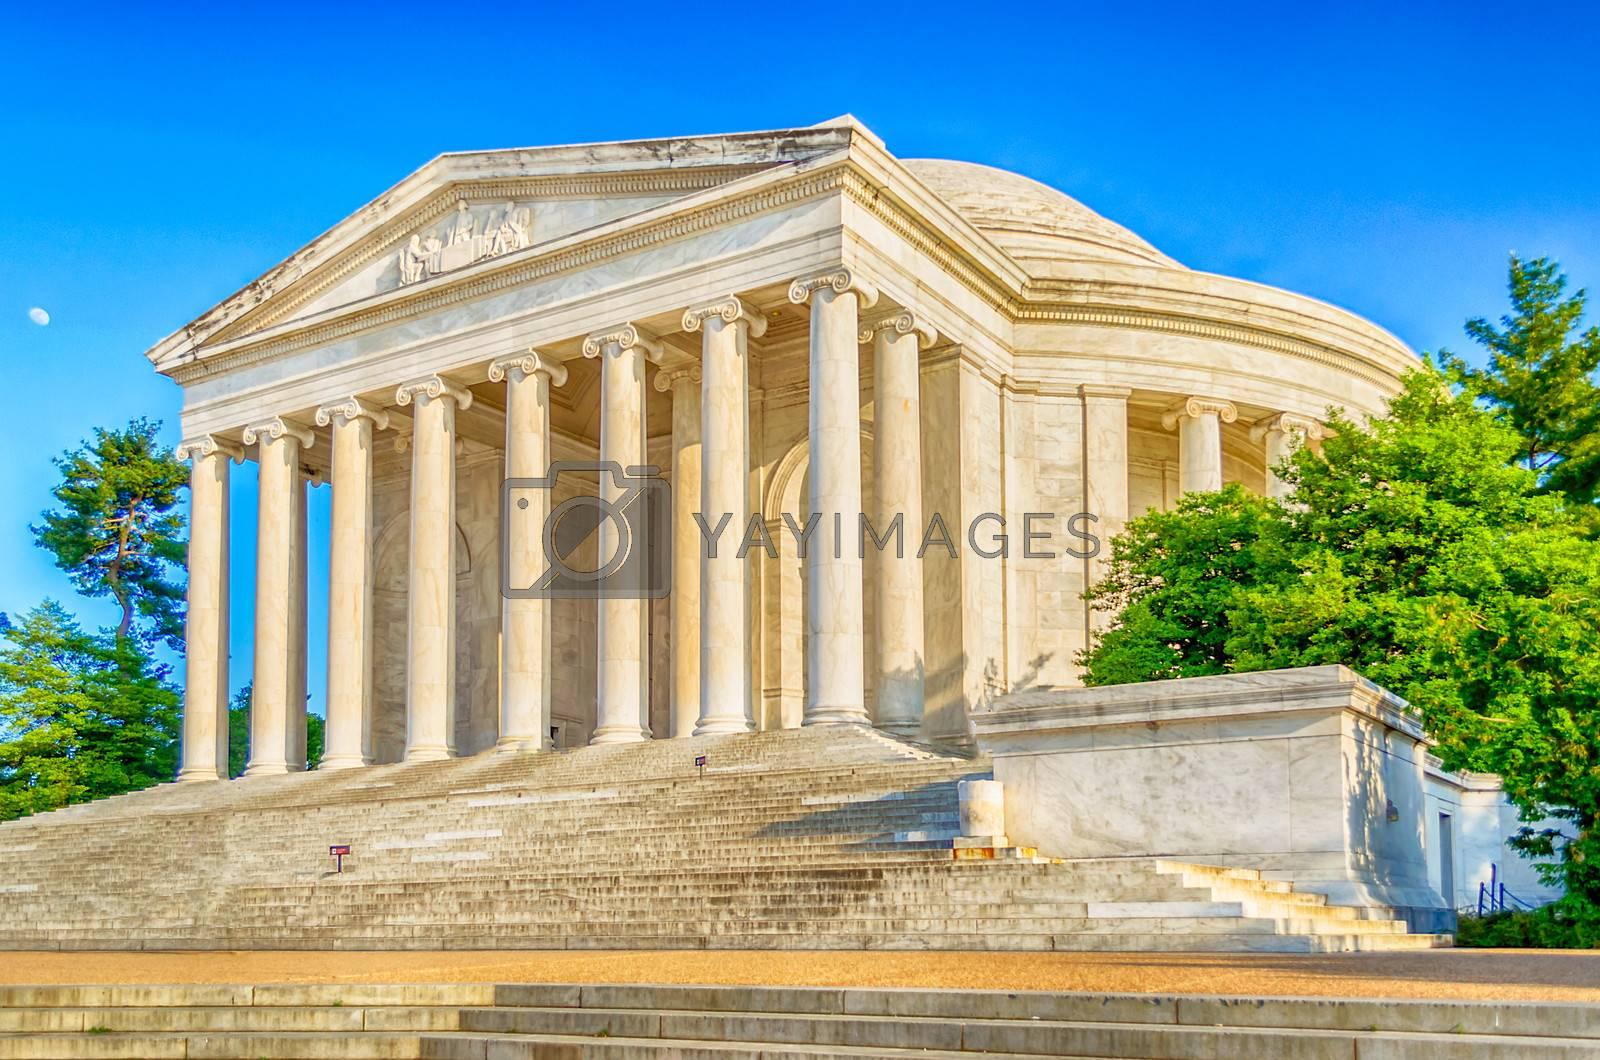 The Jefferson Memorial in Washington DC in daylight